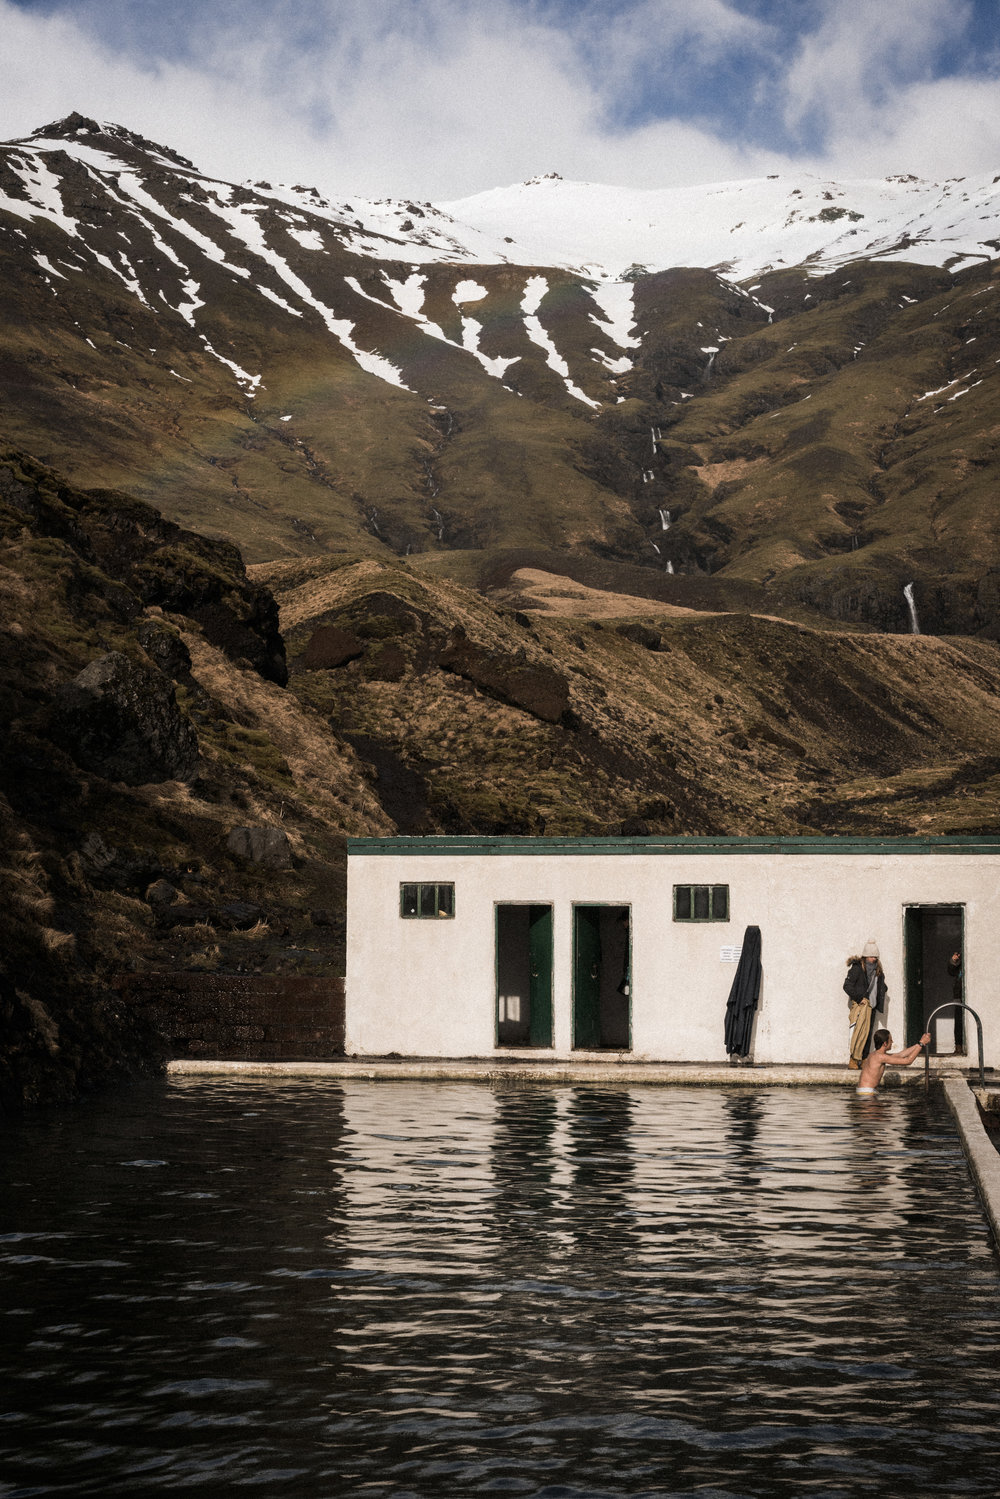 ICELAND_WOMAN_PHOTOGRAPHER_TARASHUPE_OUTDOOR_PHOTOGRAPHY_041.jpg